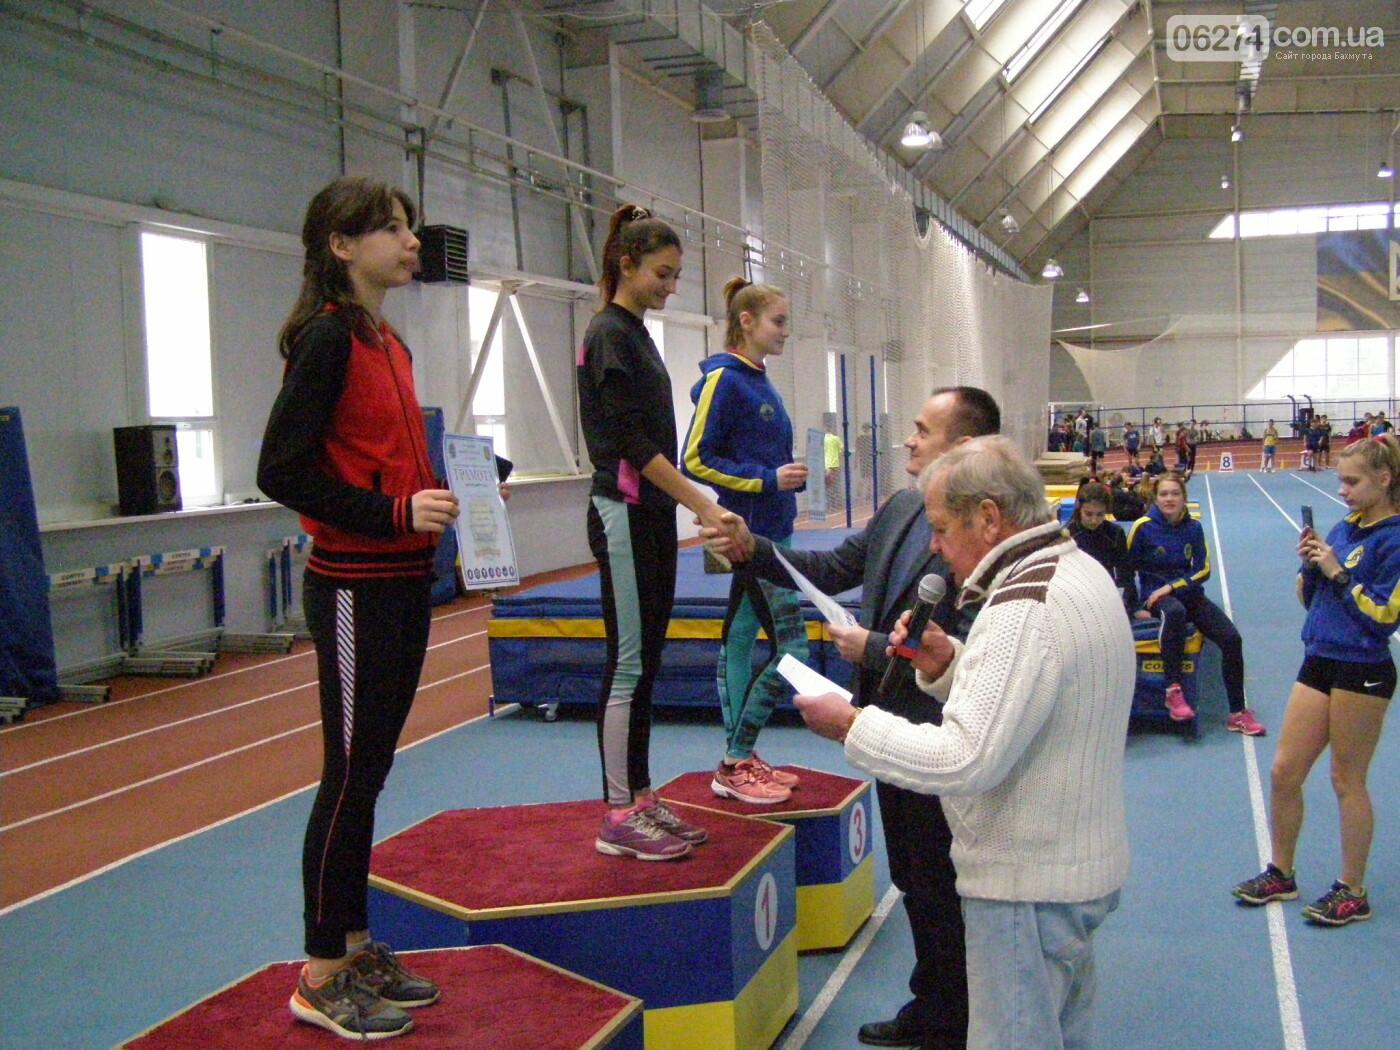 Бахмут принял чемпионат Донецкой области по легкой атлетике , фото-6